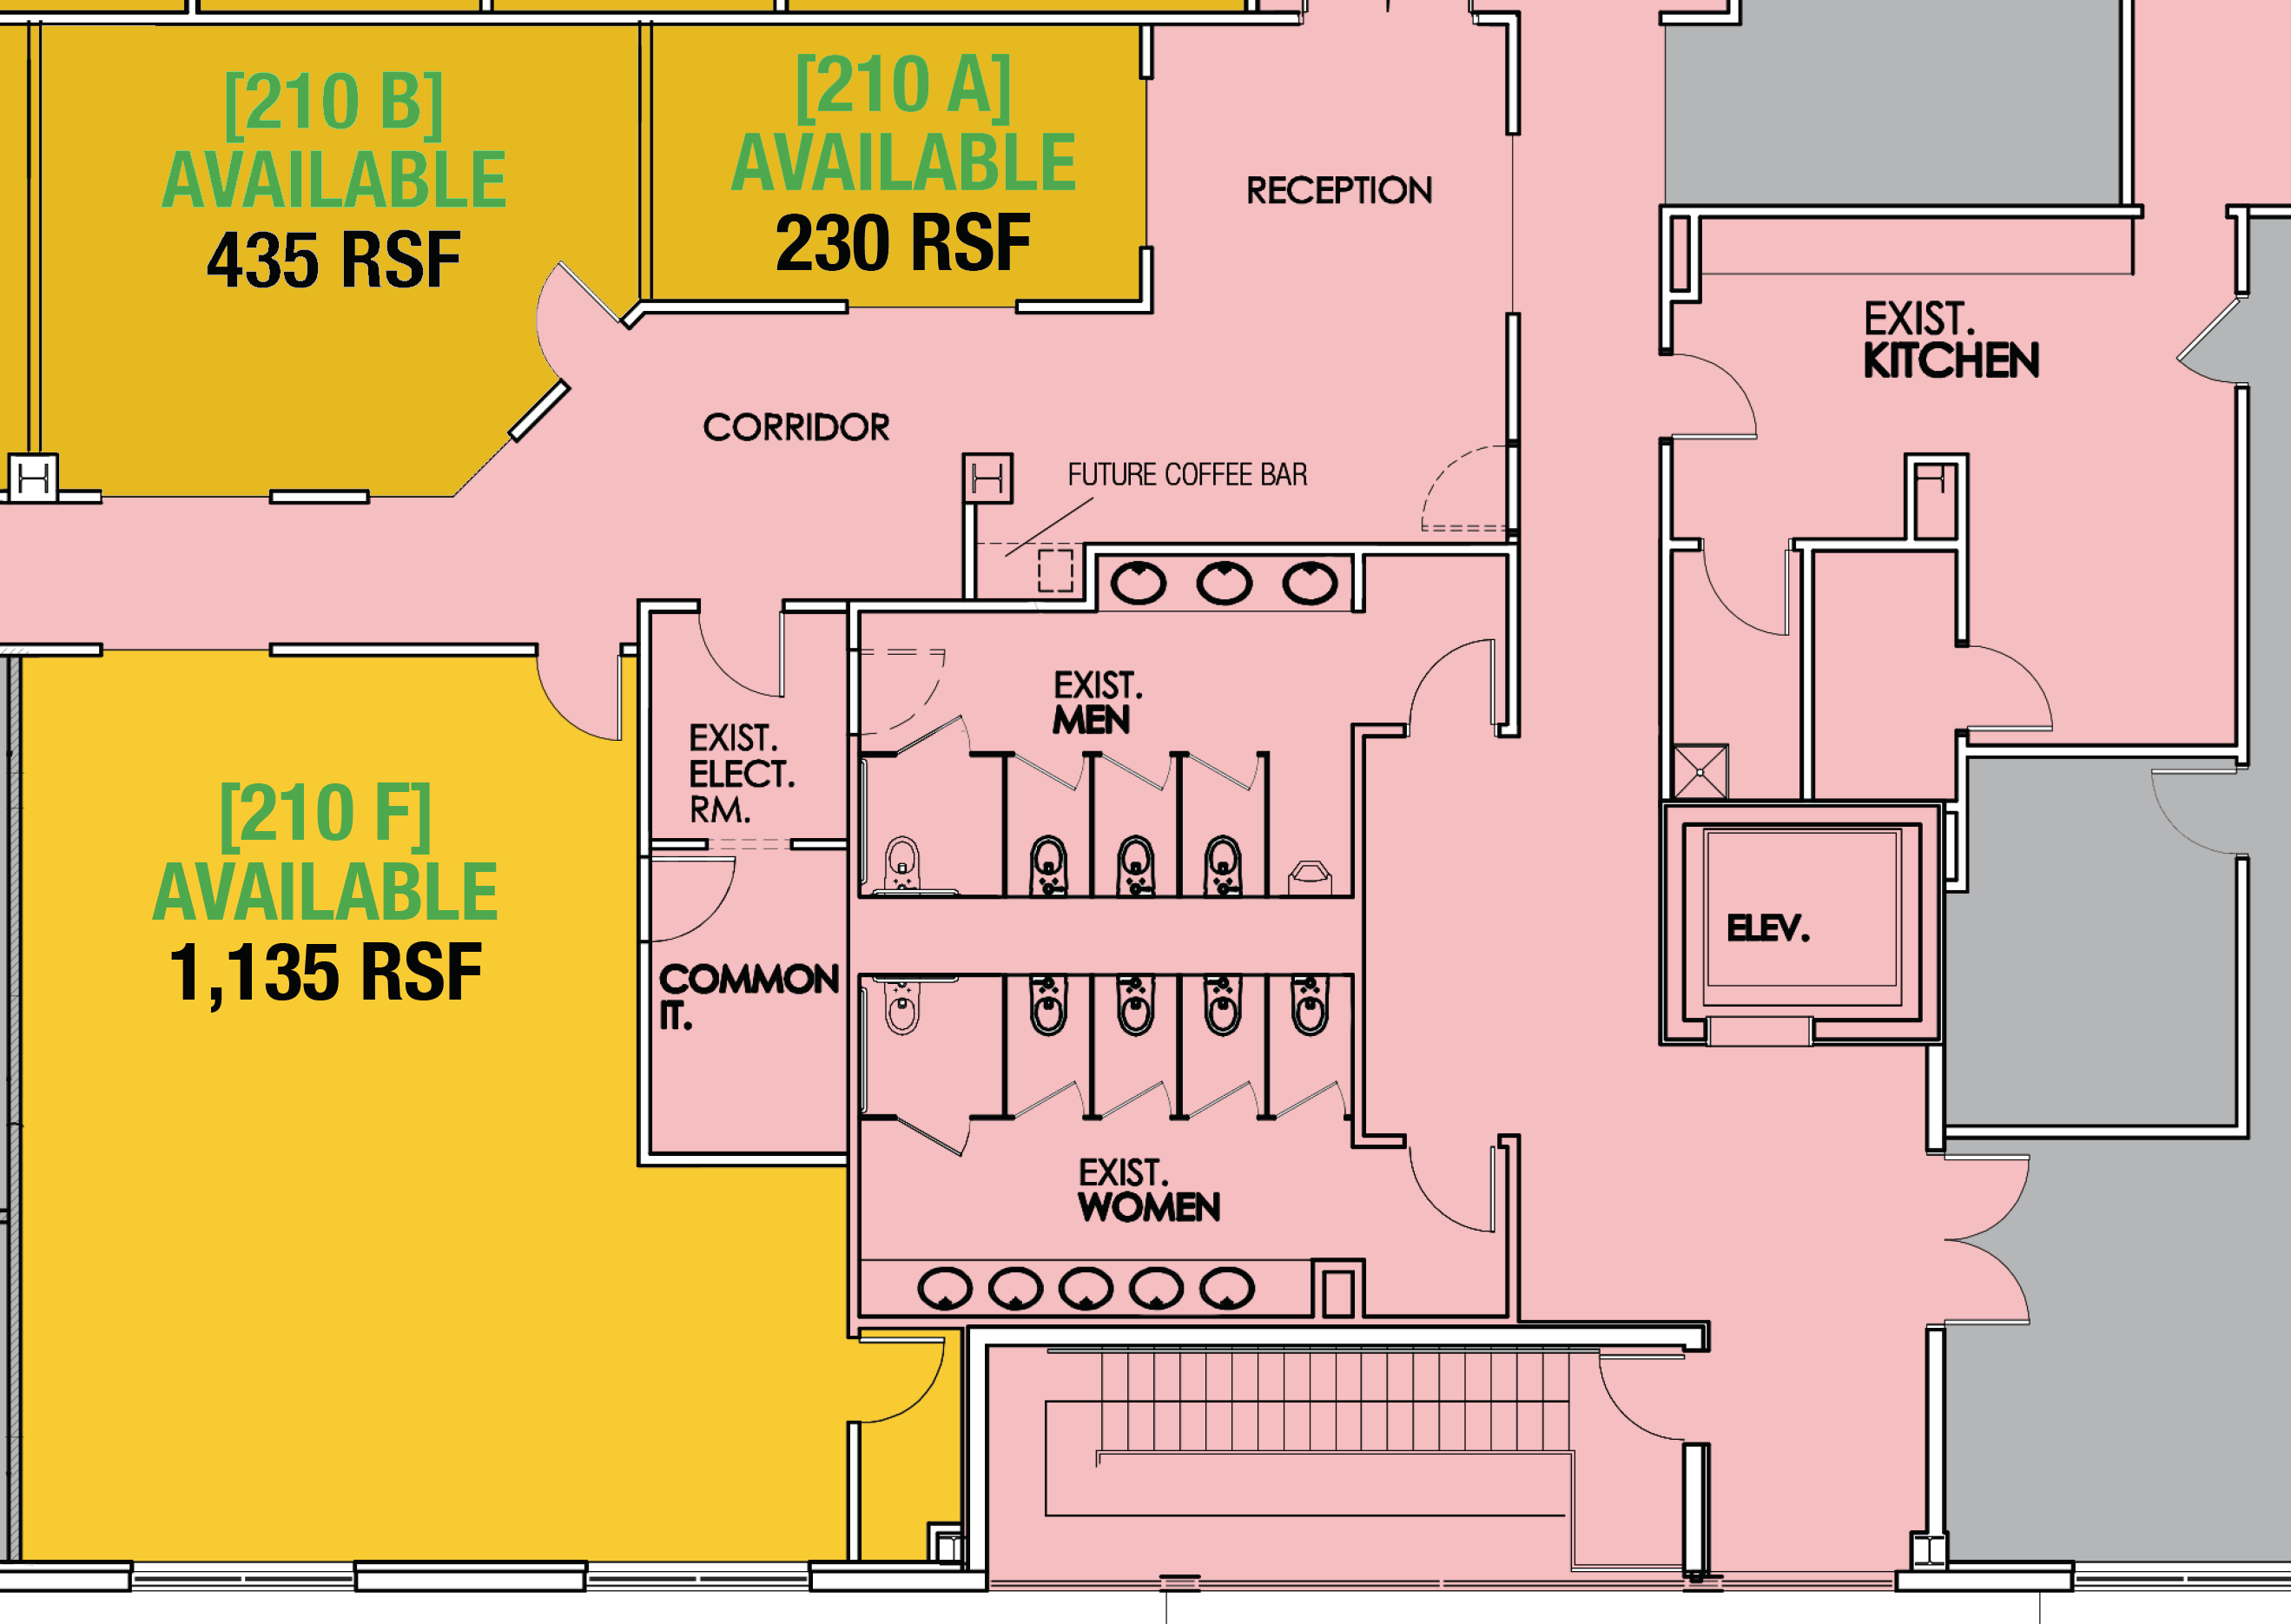 SUITE 210F - 1,135 RSF